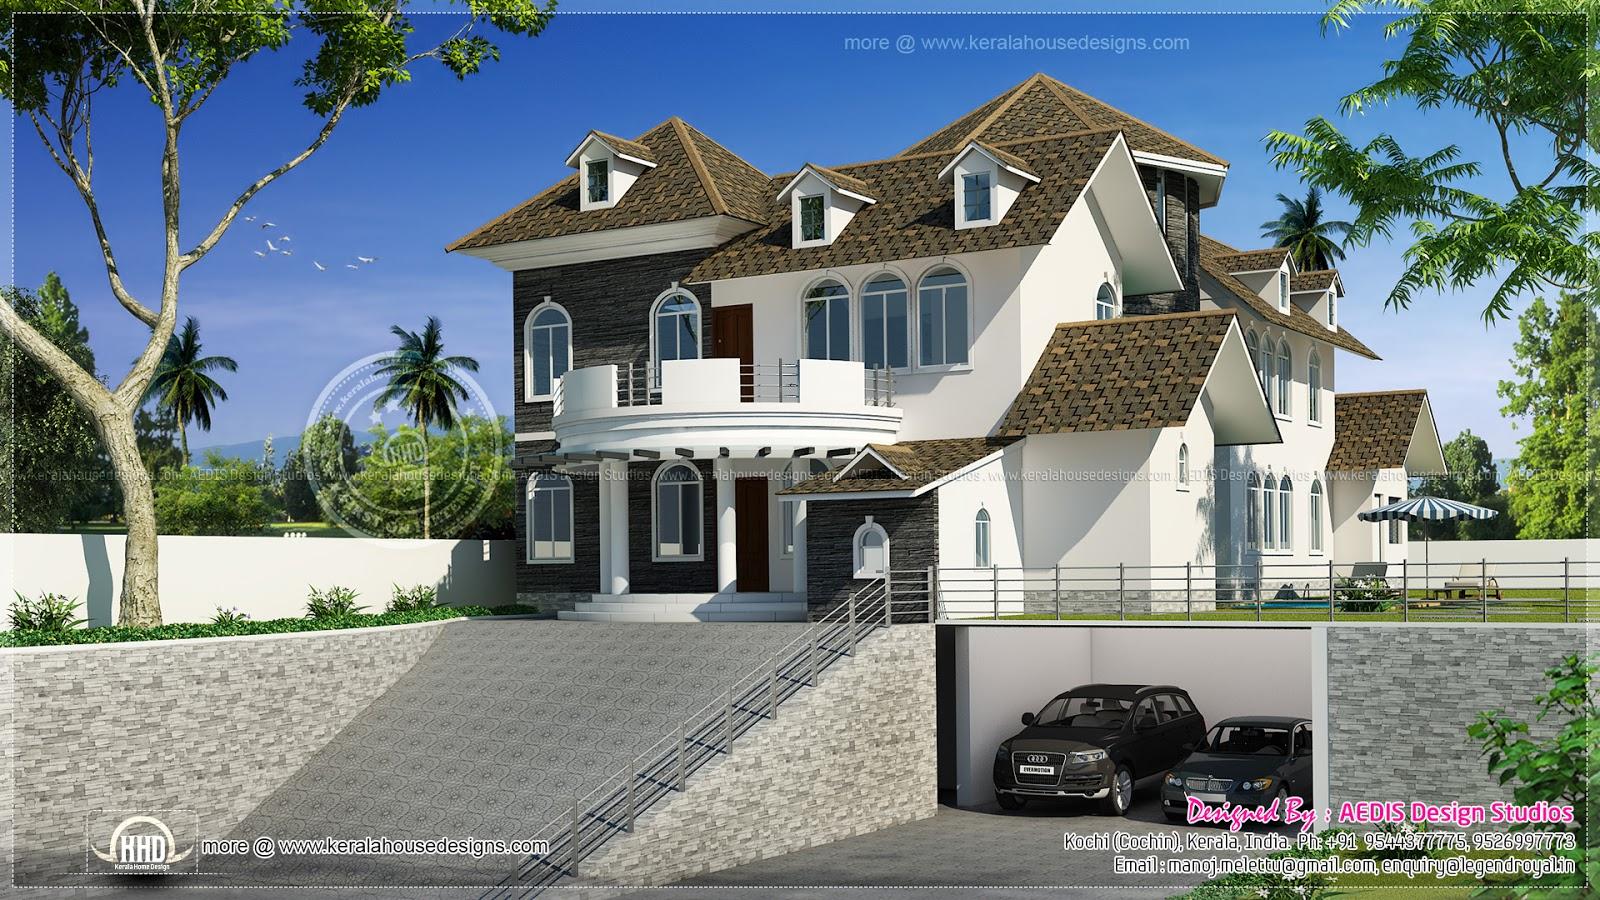 3400 square feet modern hill side home design - Kerala ...